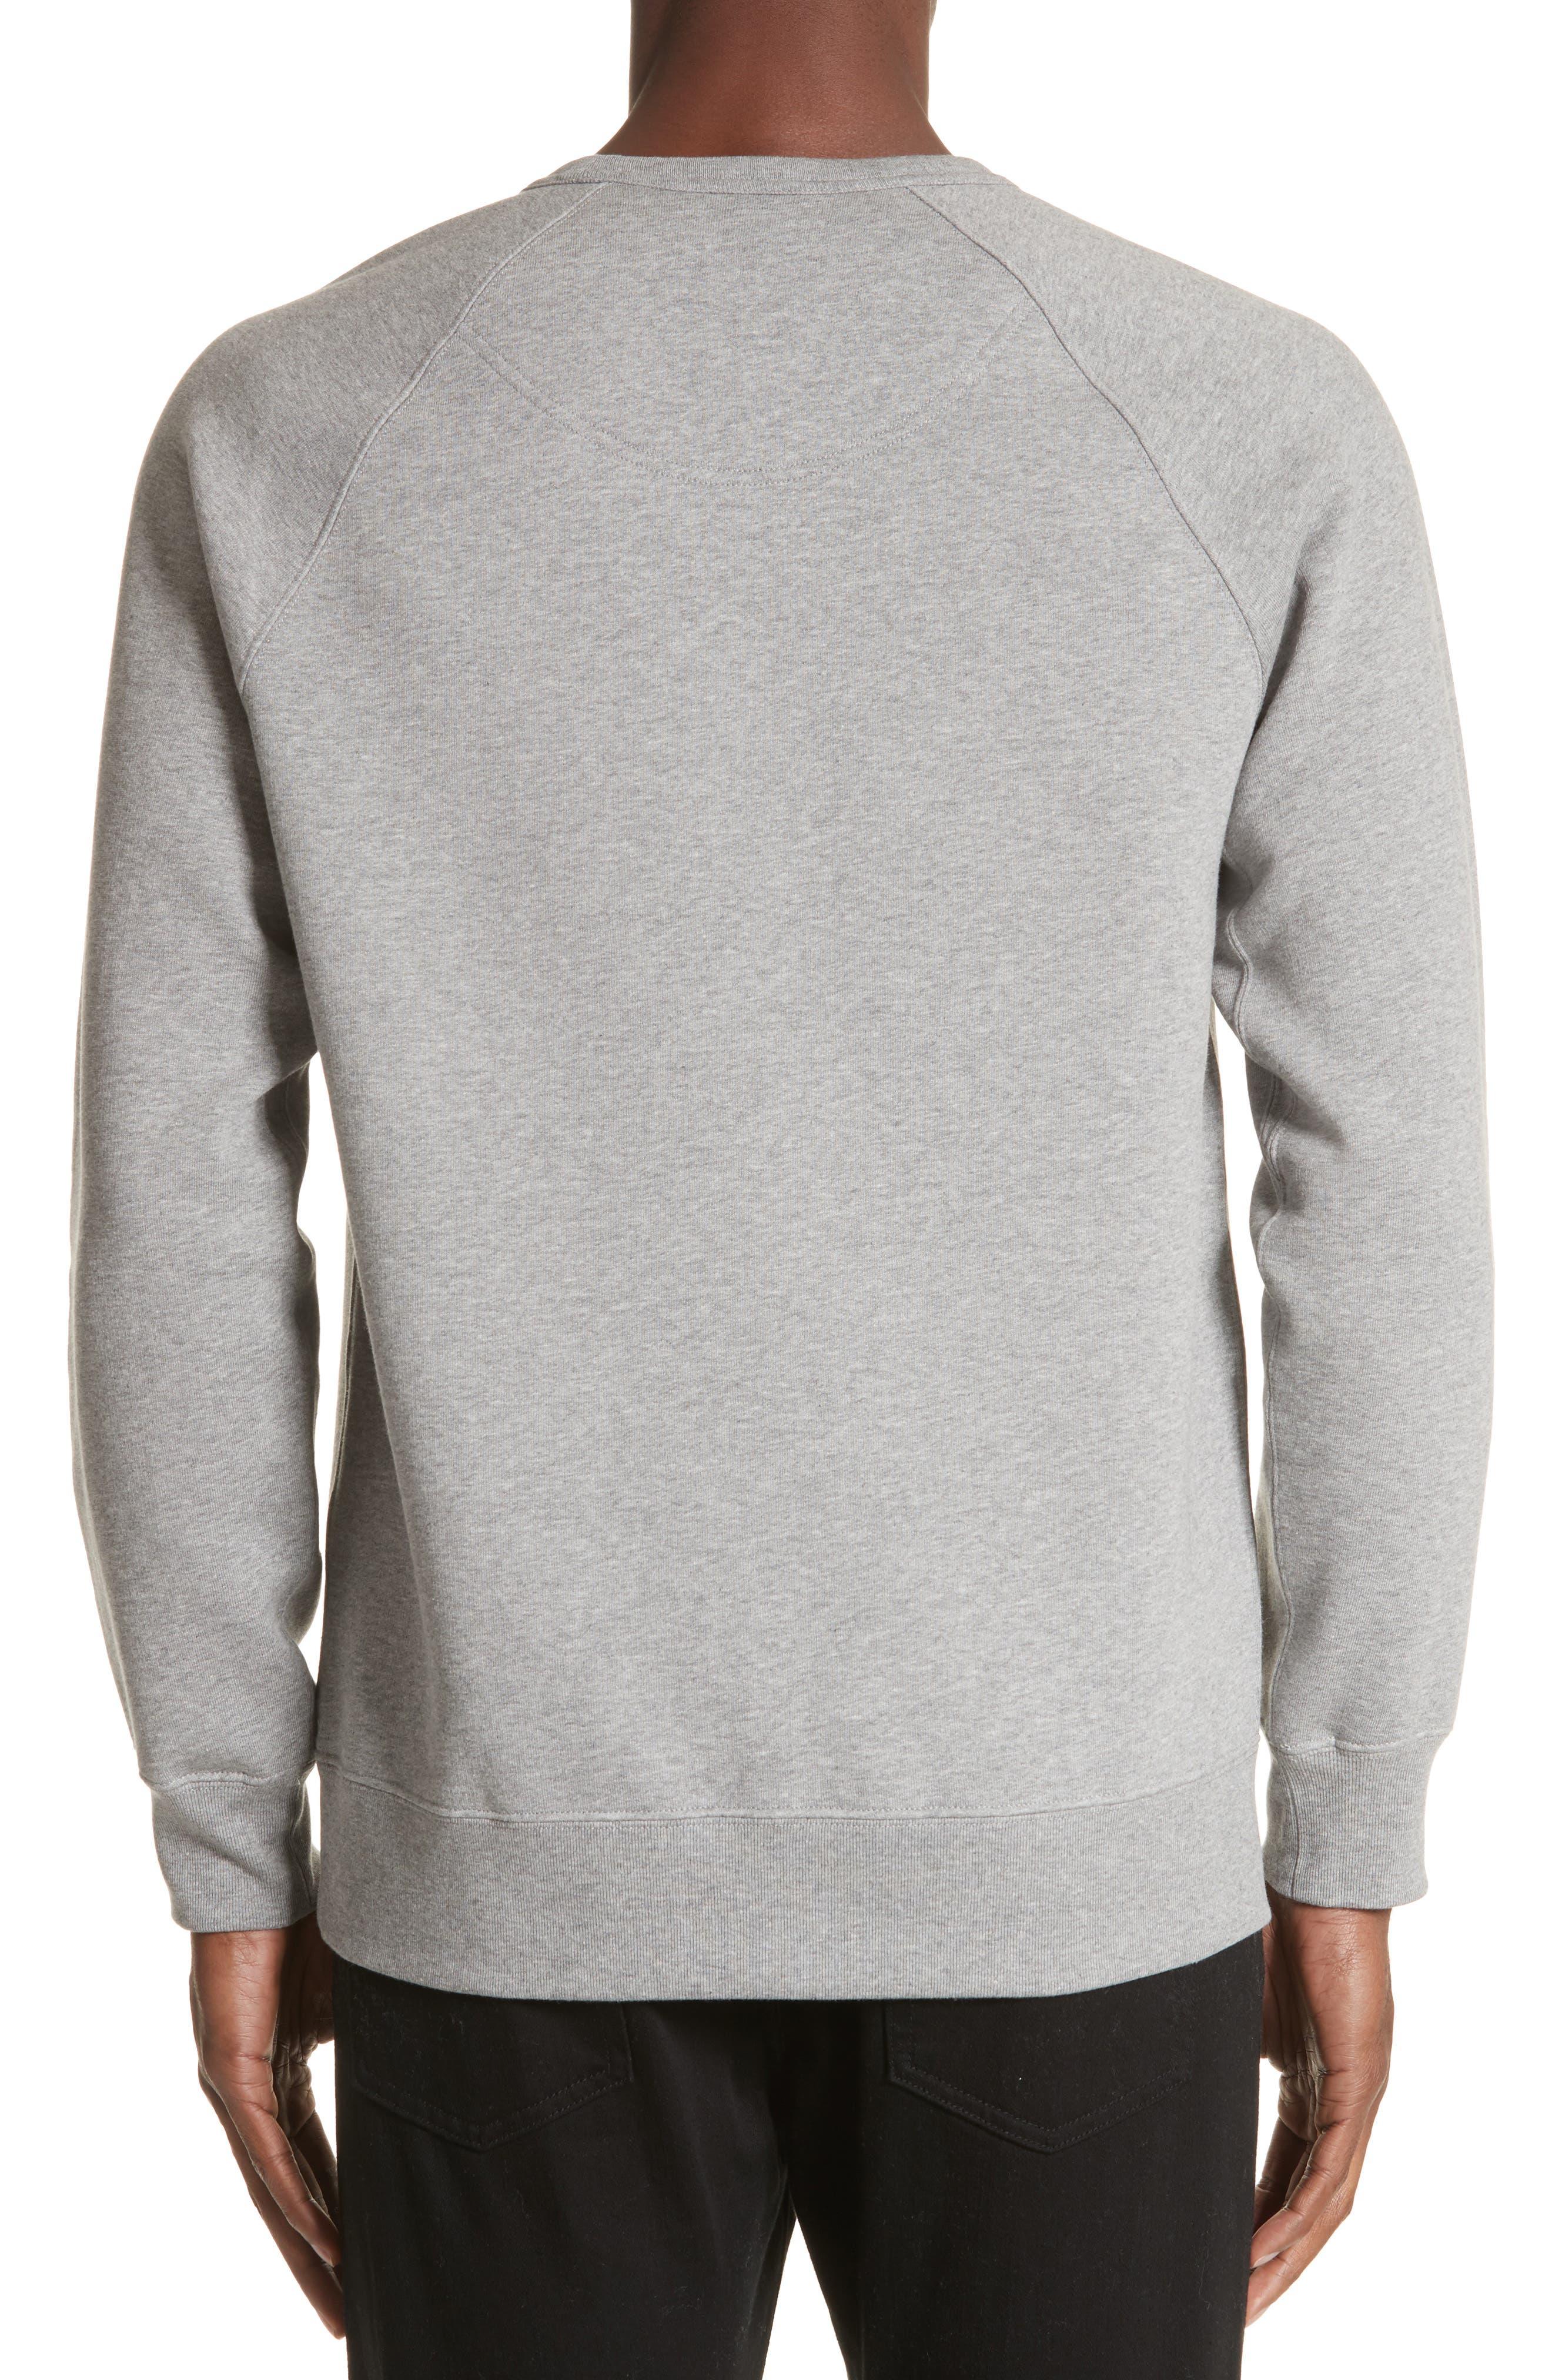 Kaneford Standard Fit Sweatshirt,                             Alternate thumbnail 2, color,